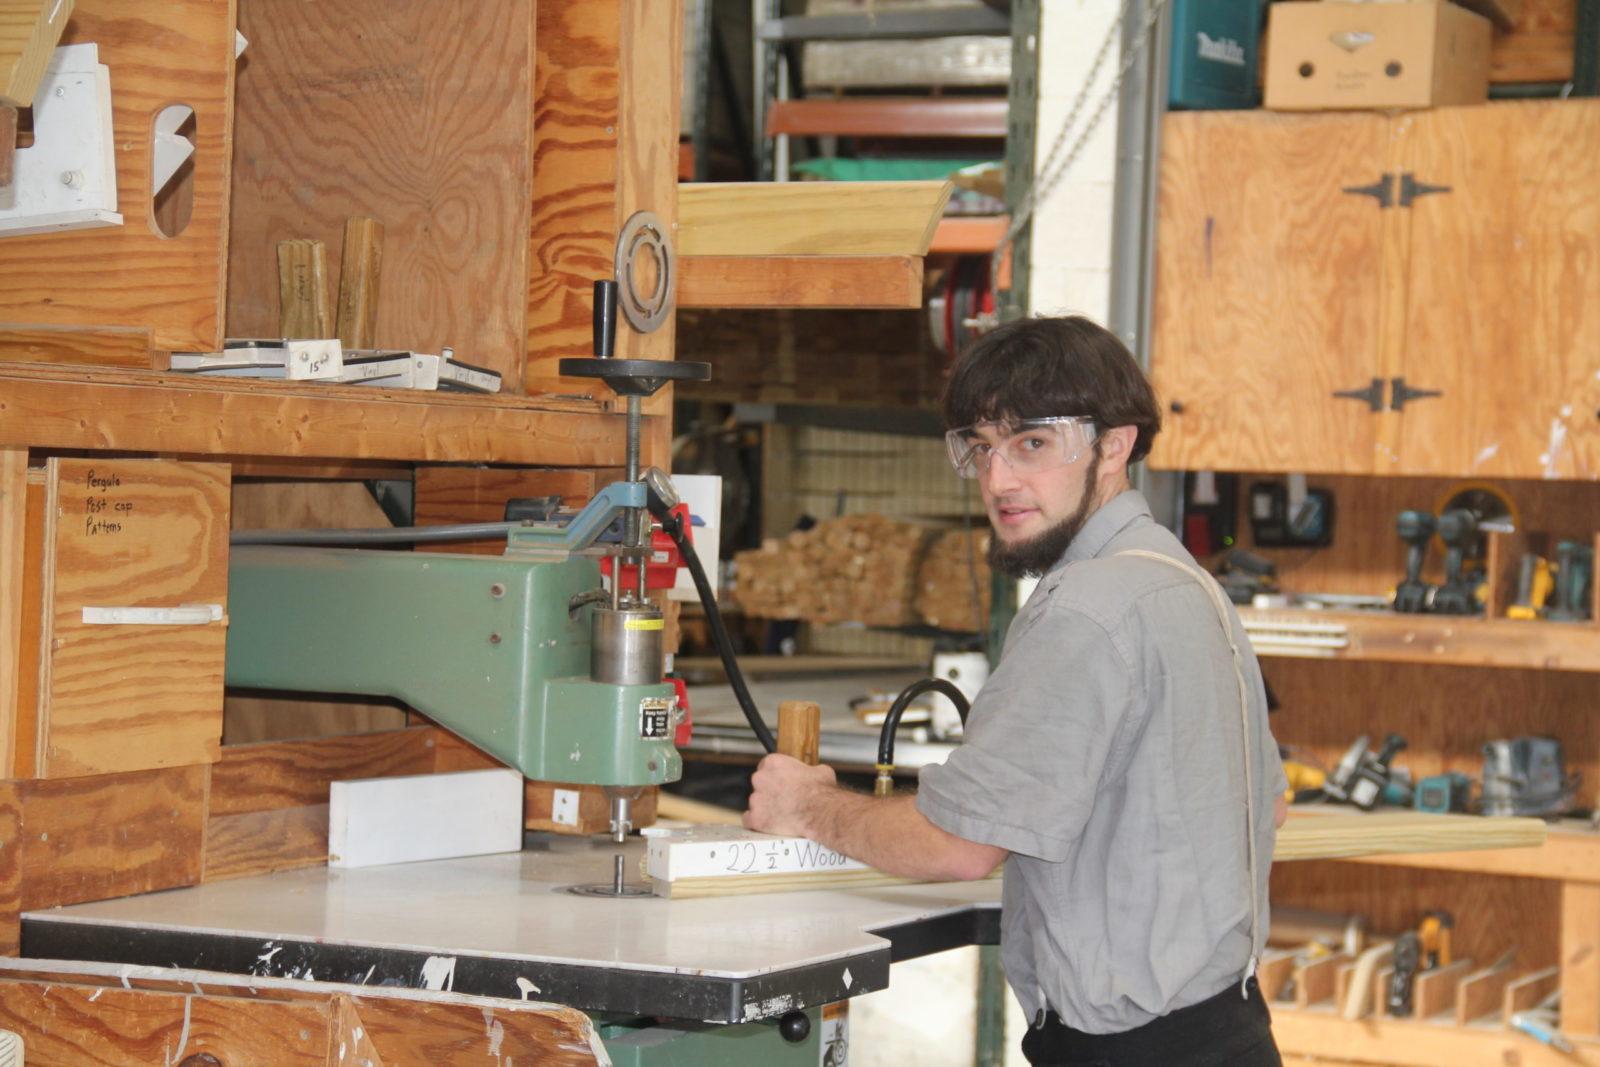 amish carpenter working on an amish pavilion